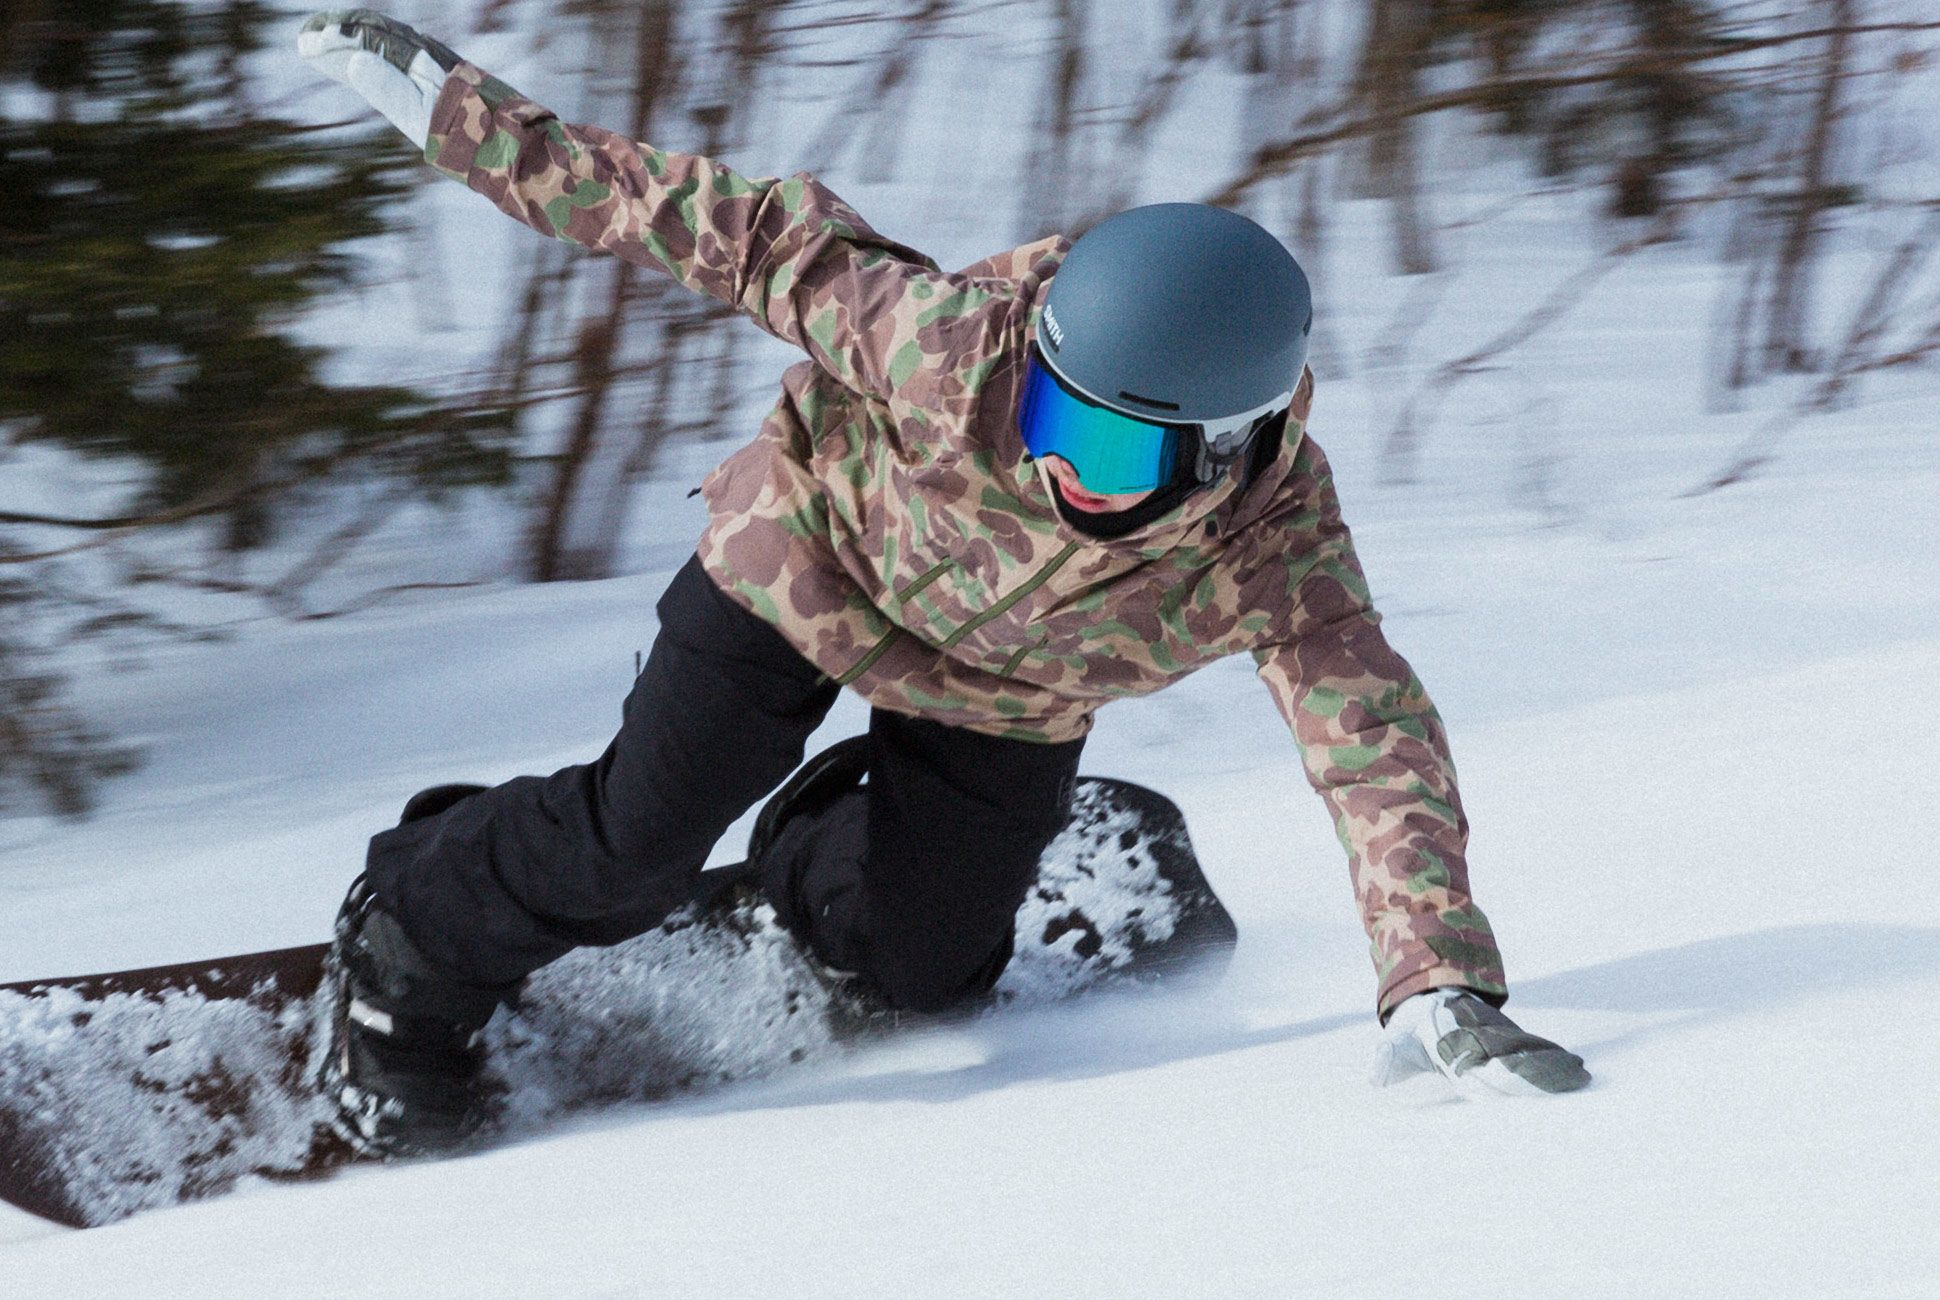 ultimate-ski-and-snow-gear-patrol-burton-slide-2